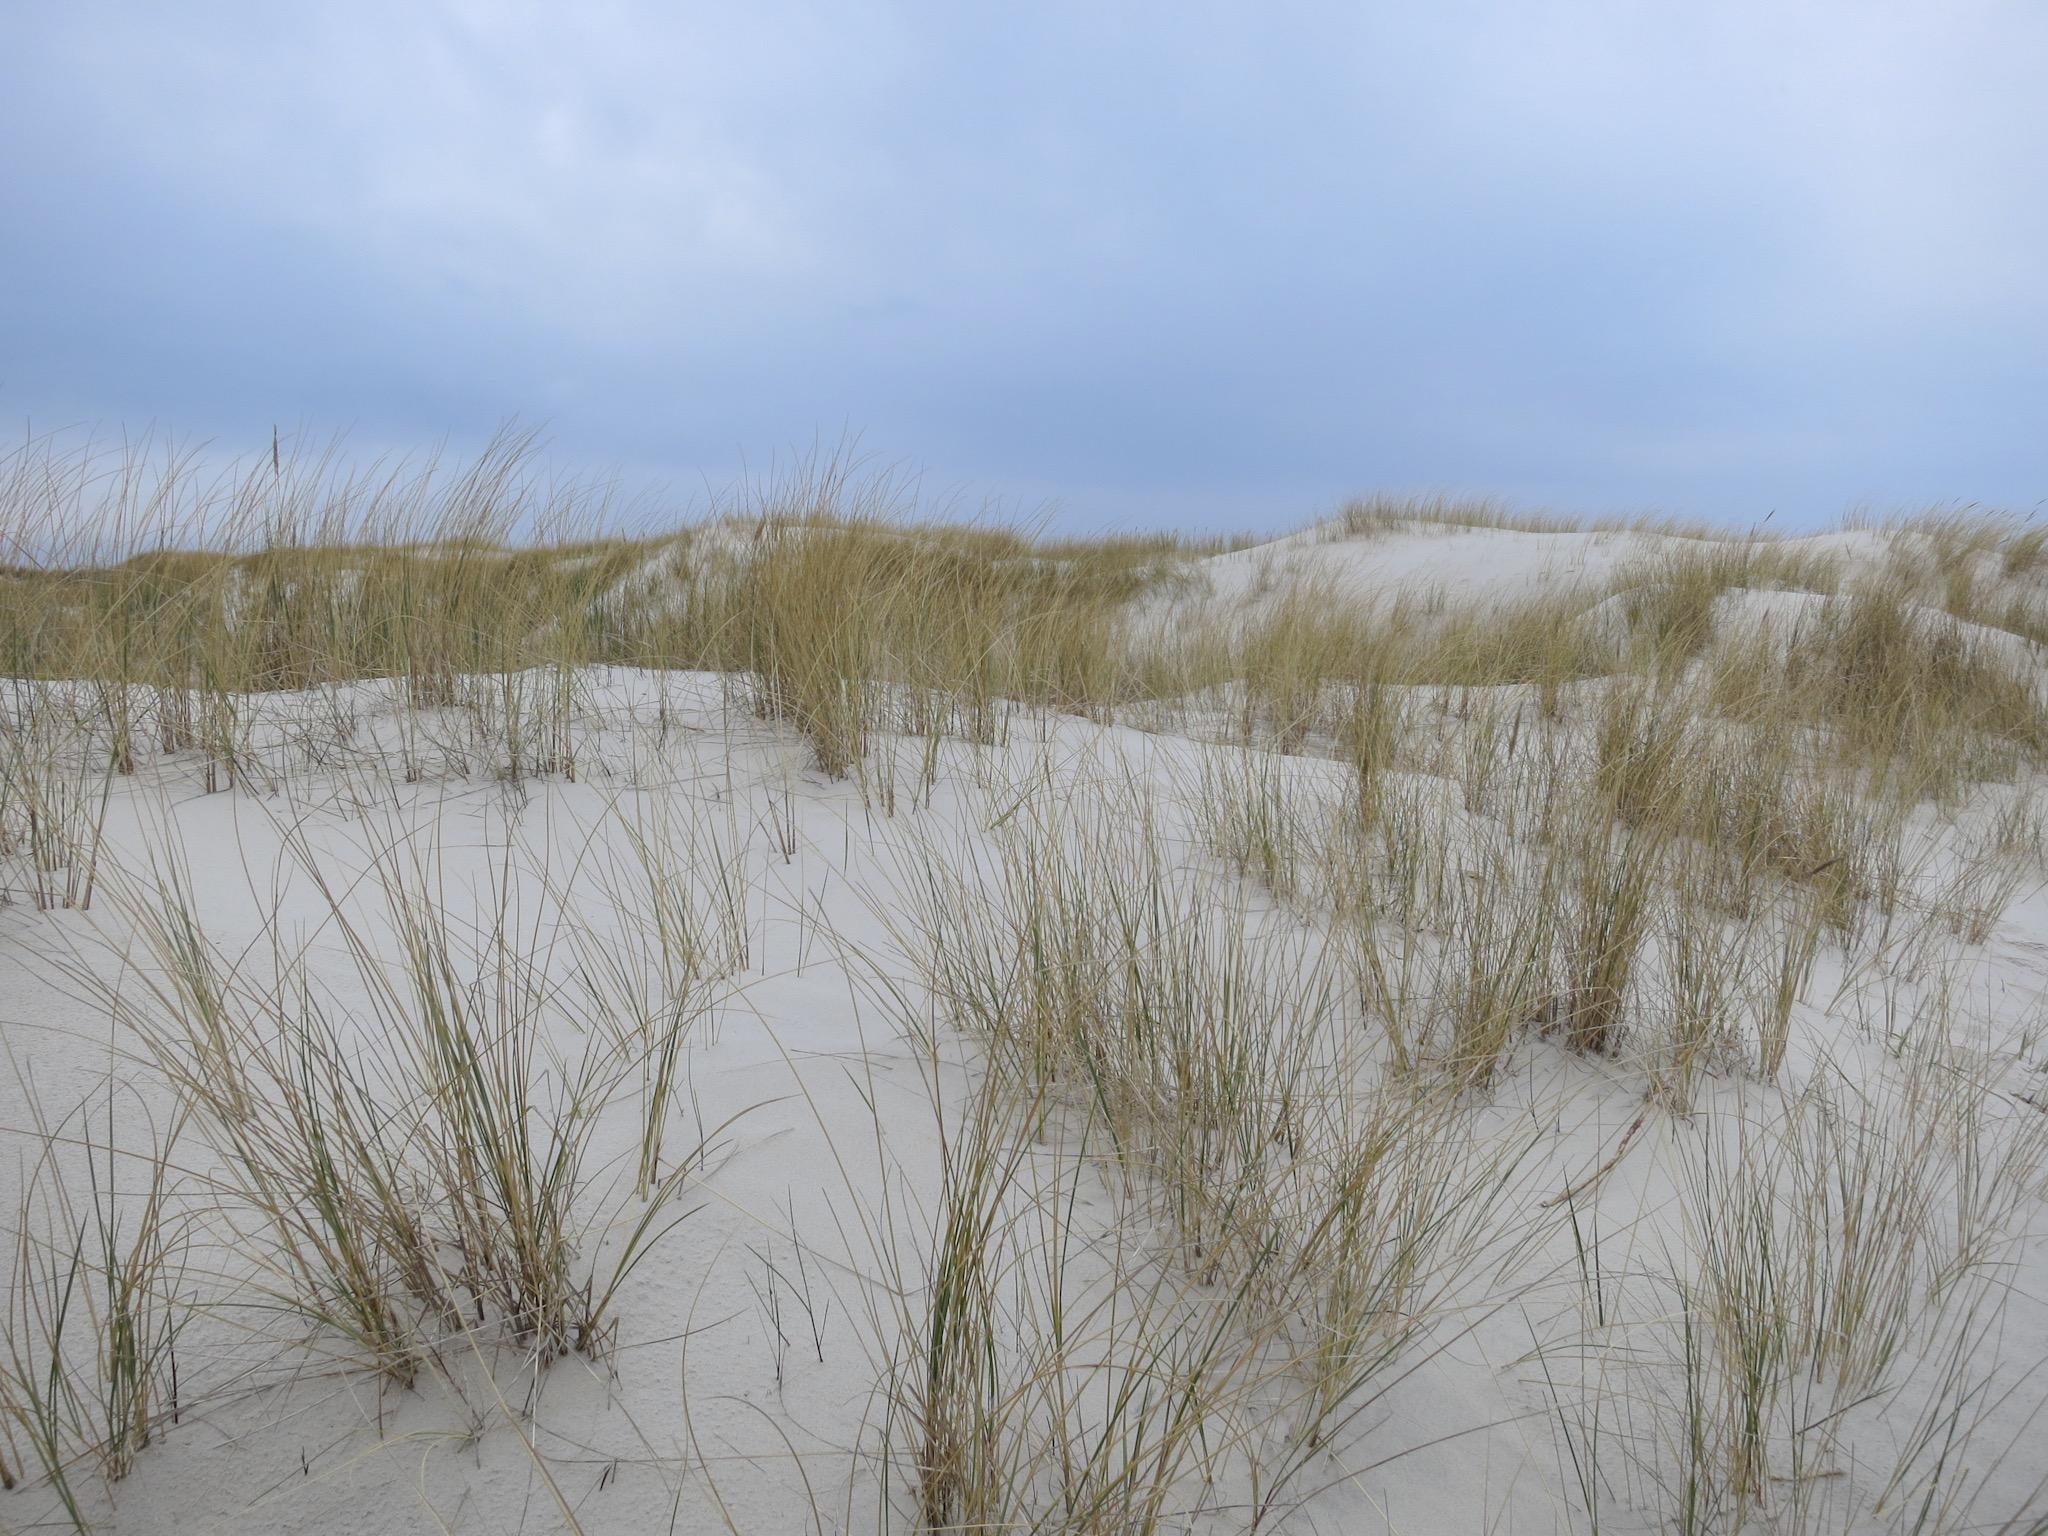 Grasses on the Łackca Sand Dune In Słowiński National Park